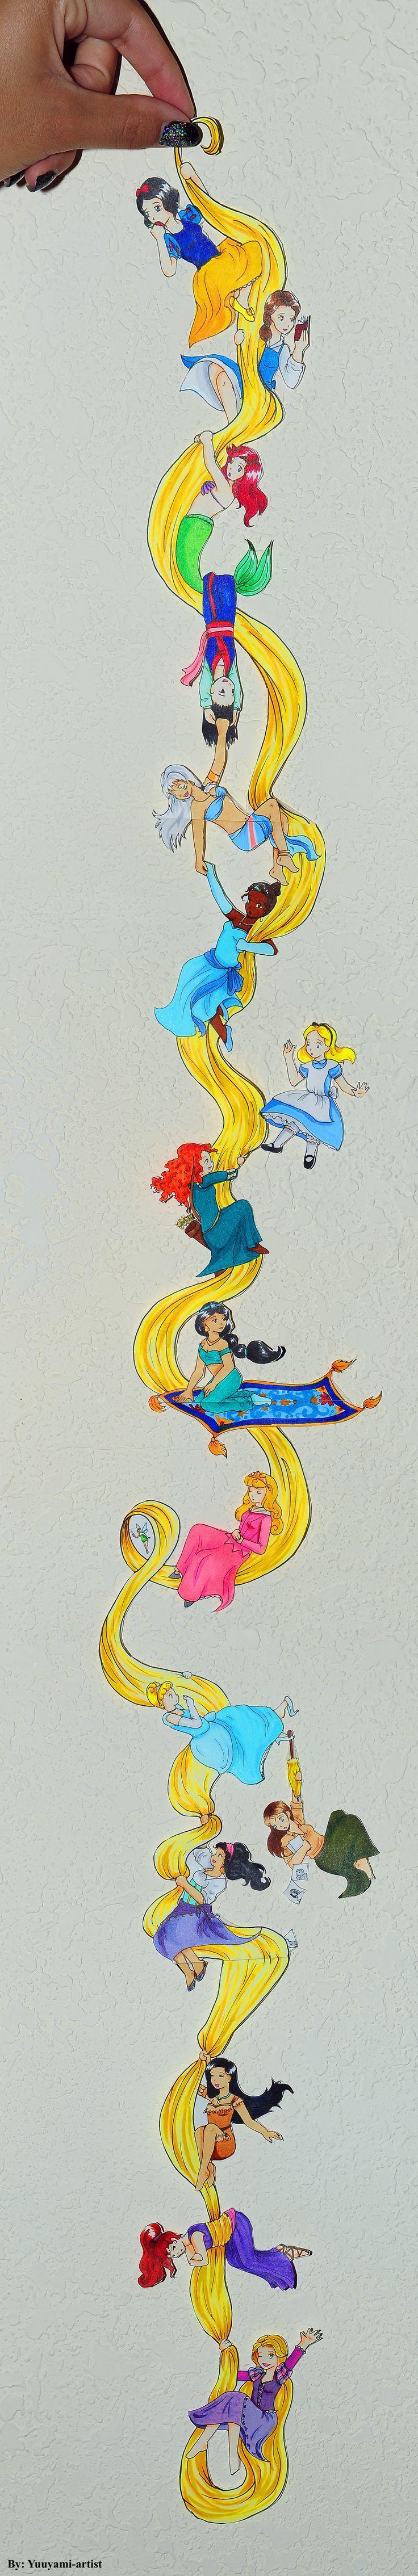 Women of Disney - Chibi Chain by yuuyami-artist.deviantart.com on @deviantART